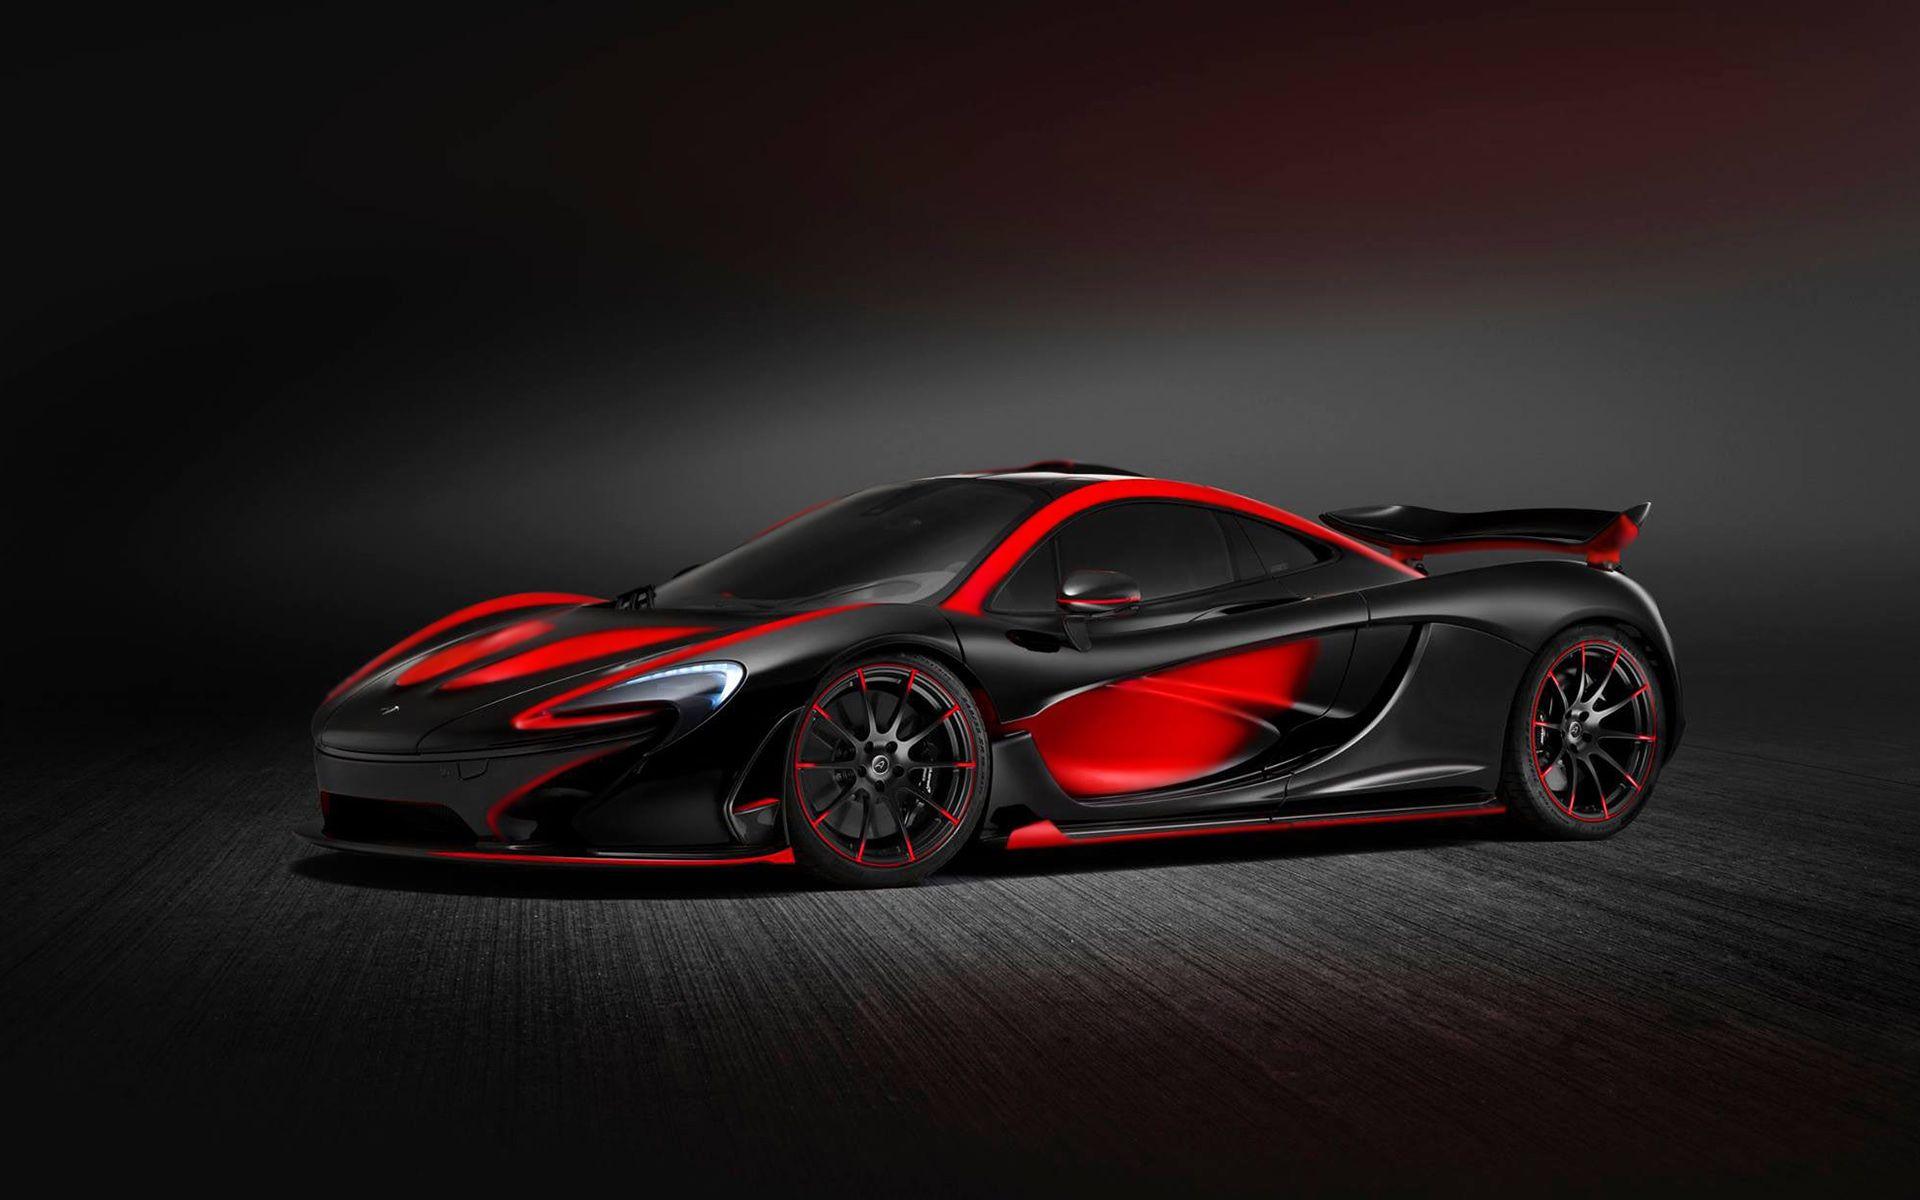 Black And Red Mclaren P1 Sports Car Hd Wallpaper Mclaren P1 Red And Black Wallpaper Sports Car